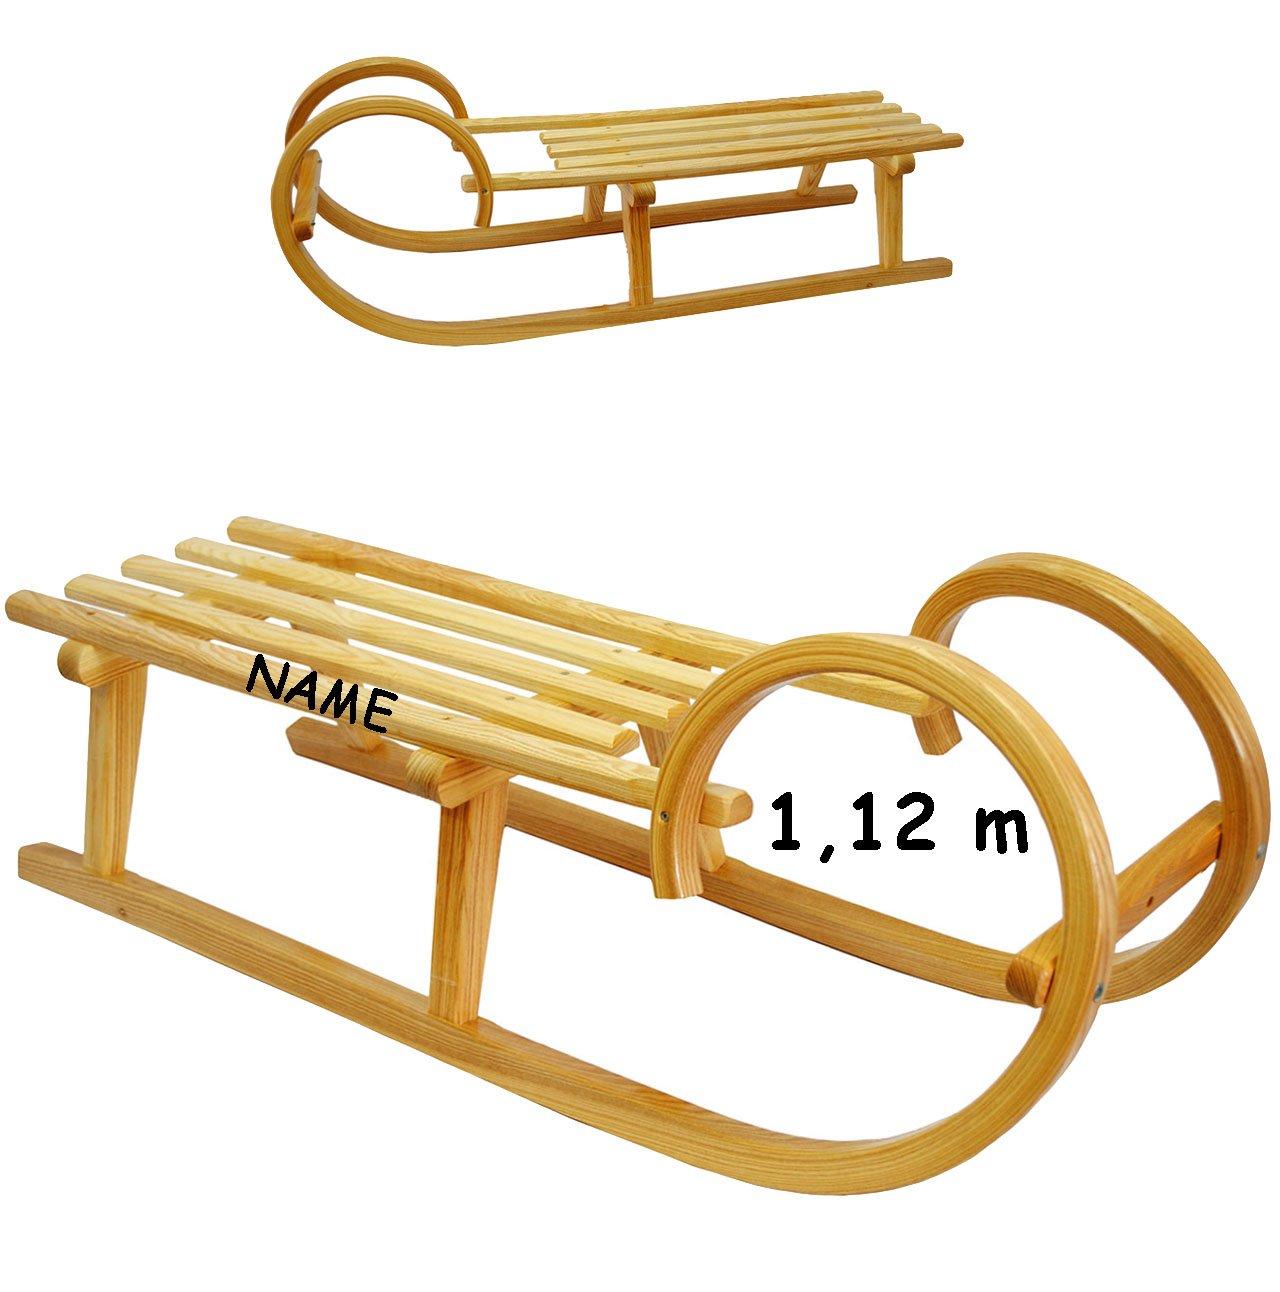 großer Holzschlitten / Hörnerschlitten - 1,12 m lang - aus stabilen Holz - incl. Name - für Kinder & Erwachsene - universal passend - Lattensitz Schlitten - Kinderschlitten / Erwachsenenschlitten- Davoser - Davos / Babyschlitten Hörnerrodel - Rodelschlitten / Rodel